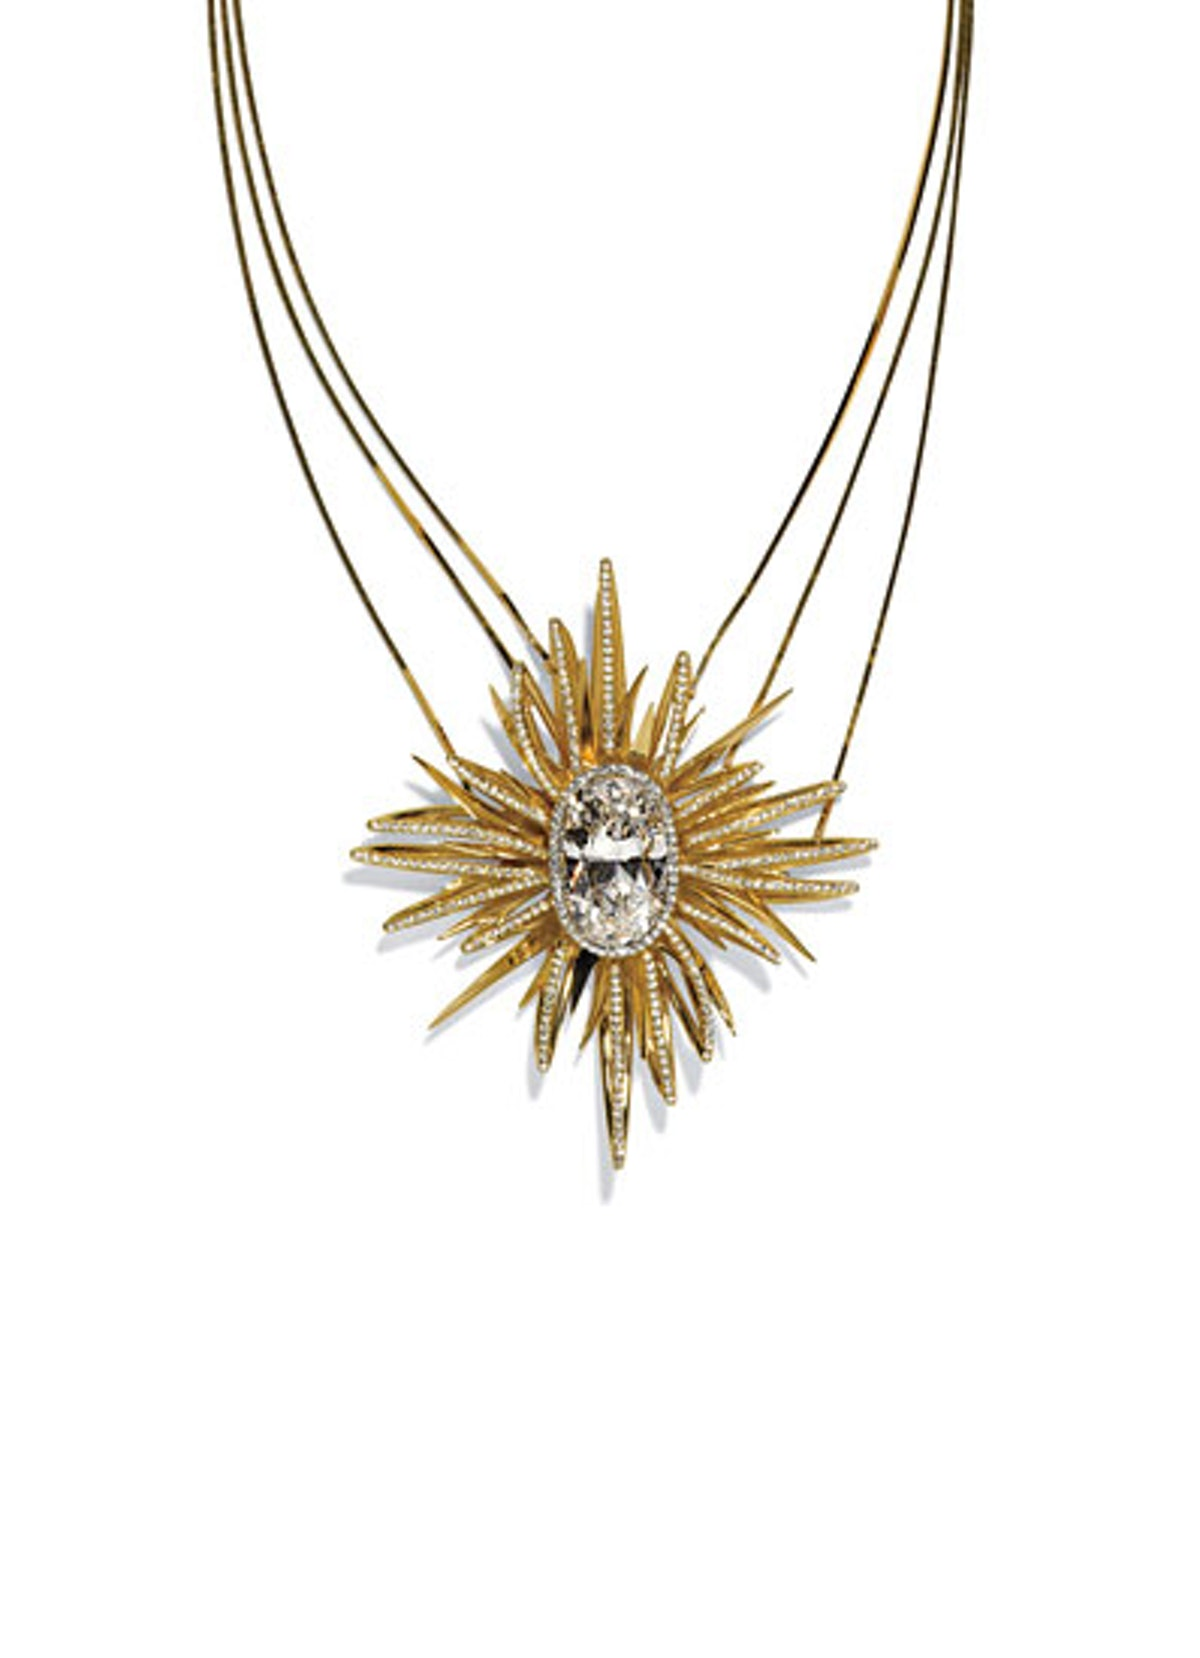 acss-claudia-jewelry-nov-2012-03-v.jpg